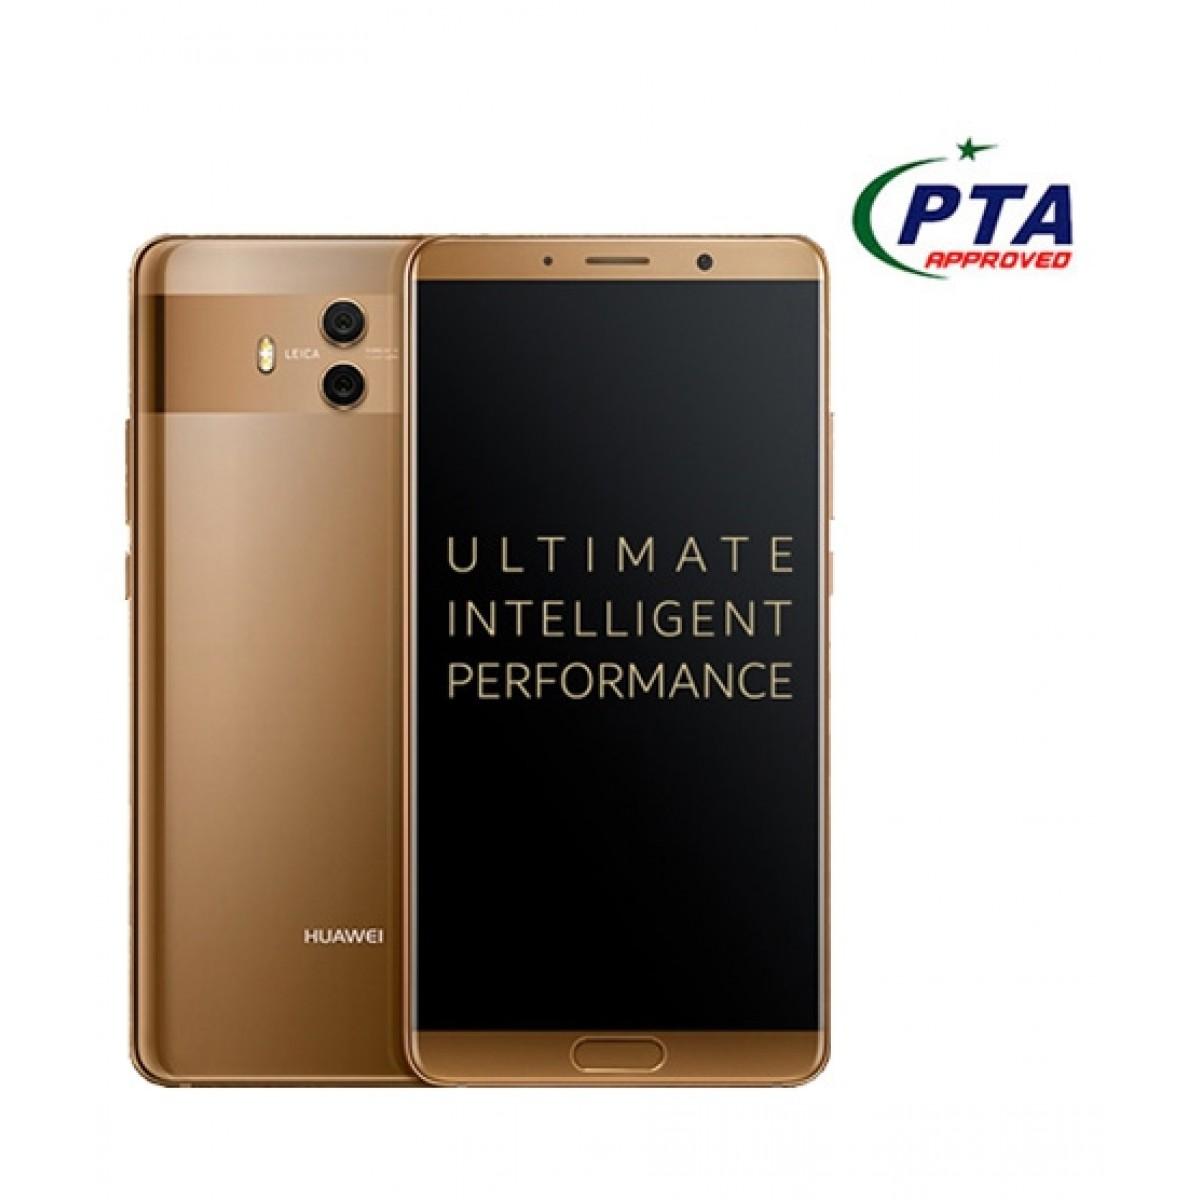 Huawei Mate 10 64GB Dual Sim Mocha Brown